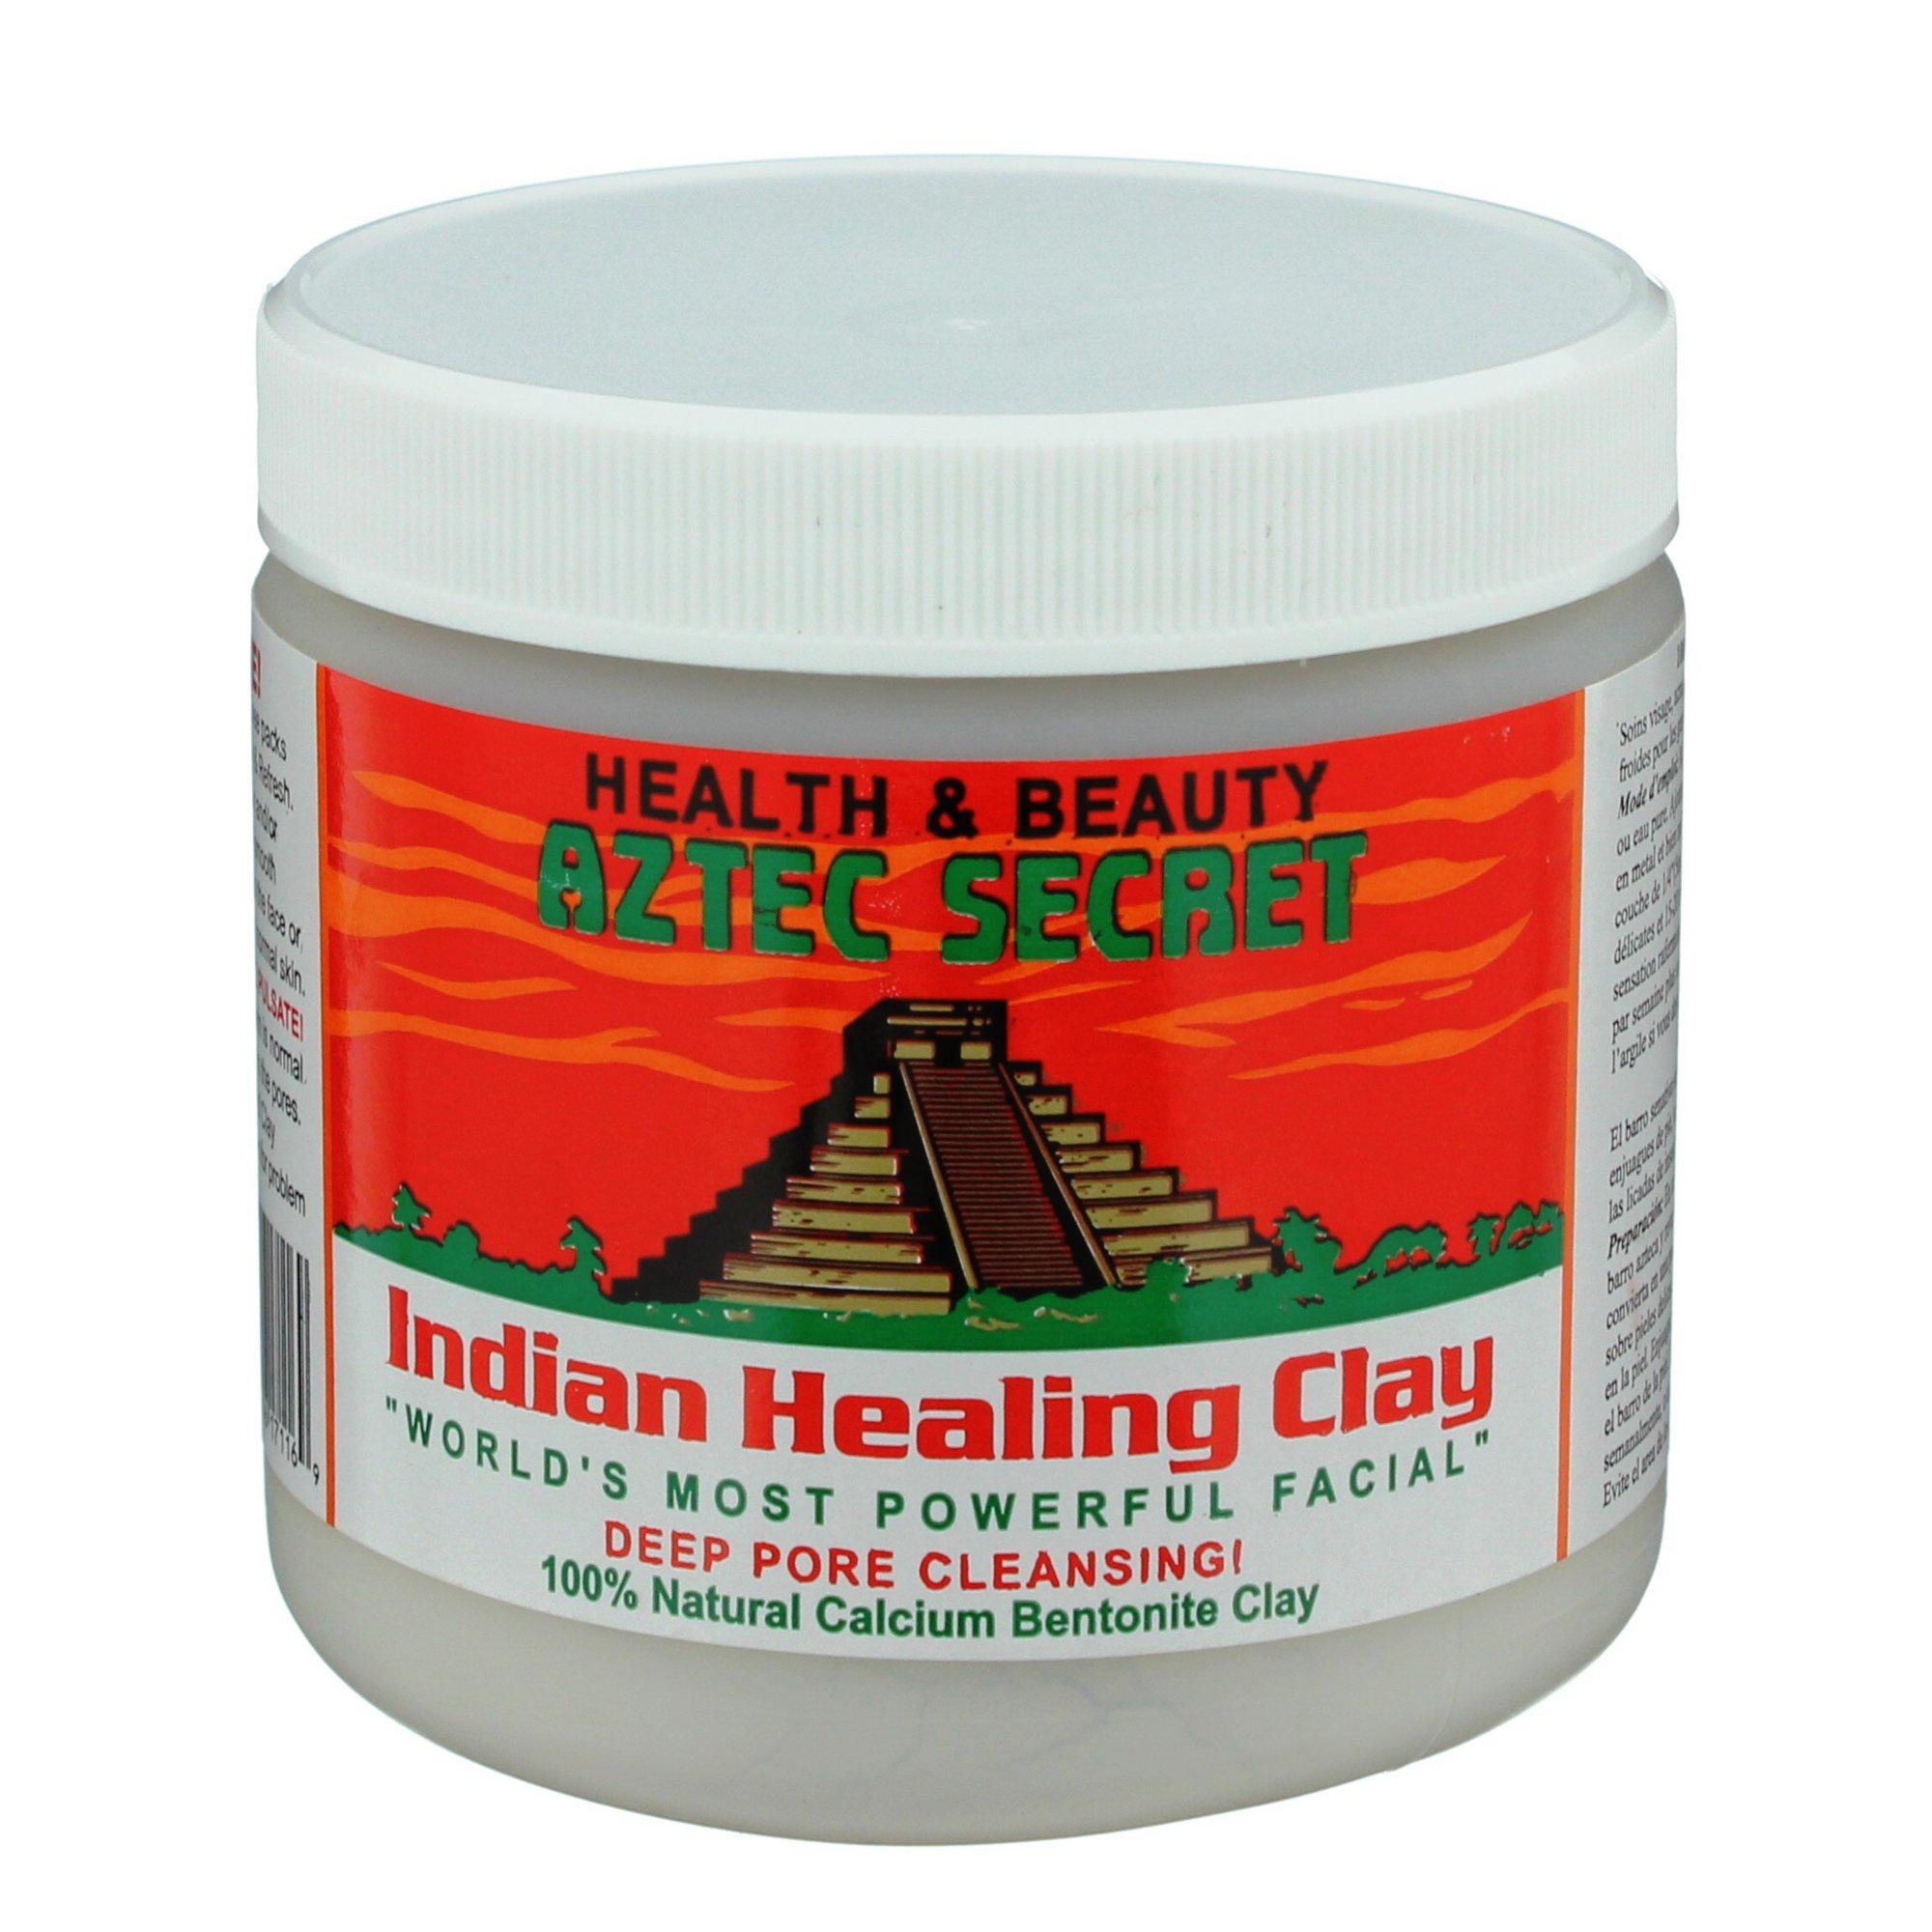 Buy Acne Aztec Secret Indian Healing Clay (Bentonite Clay